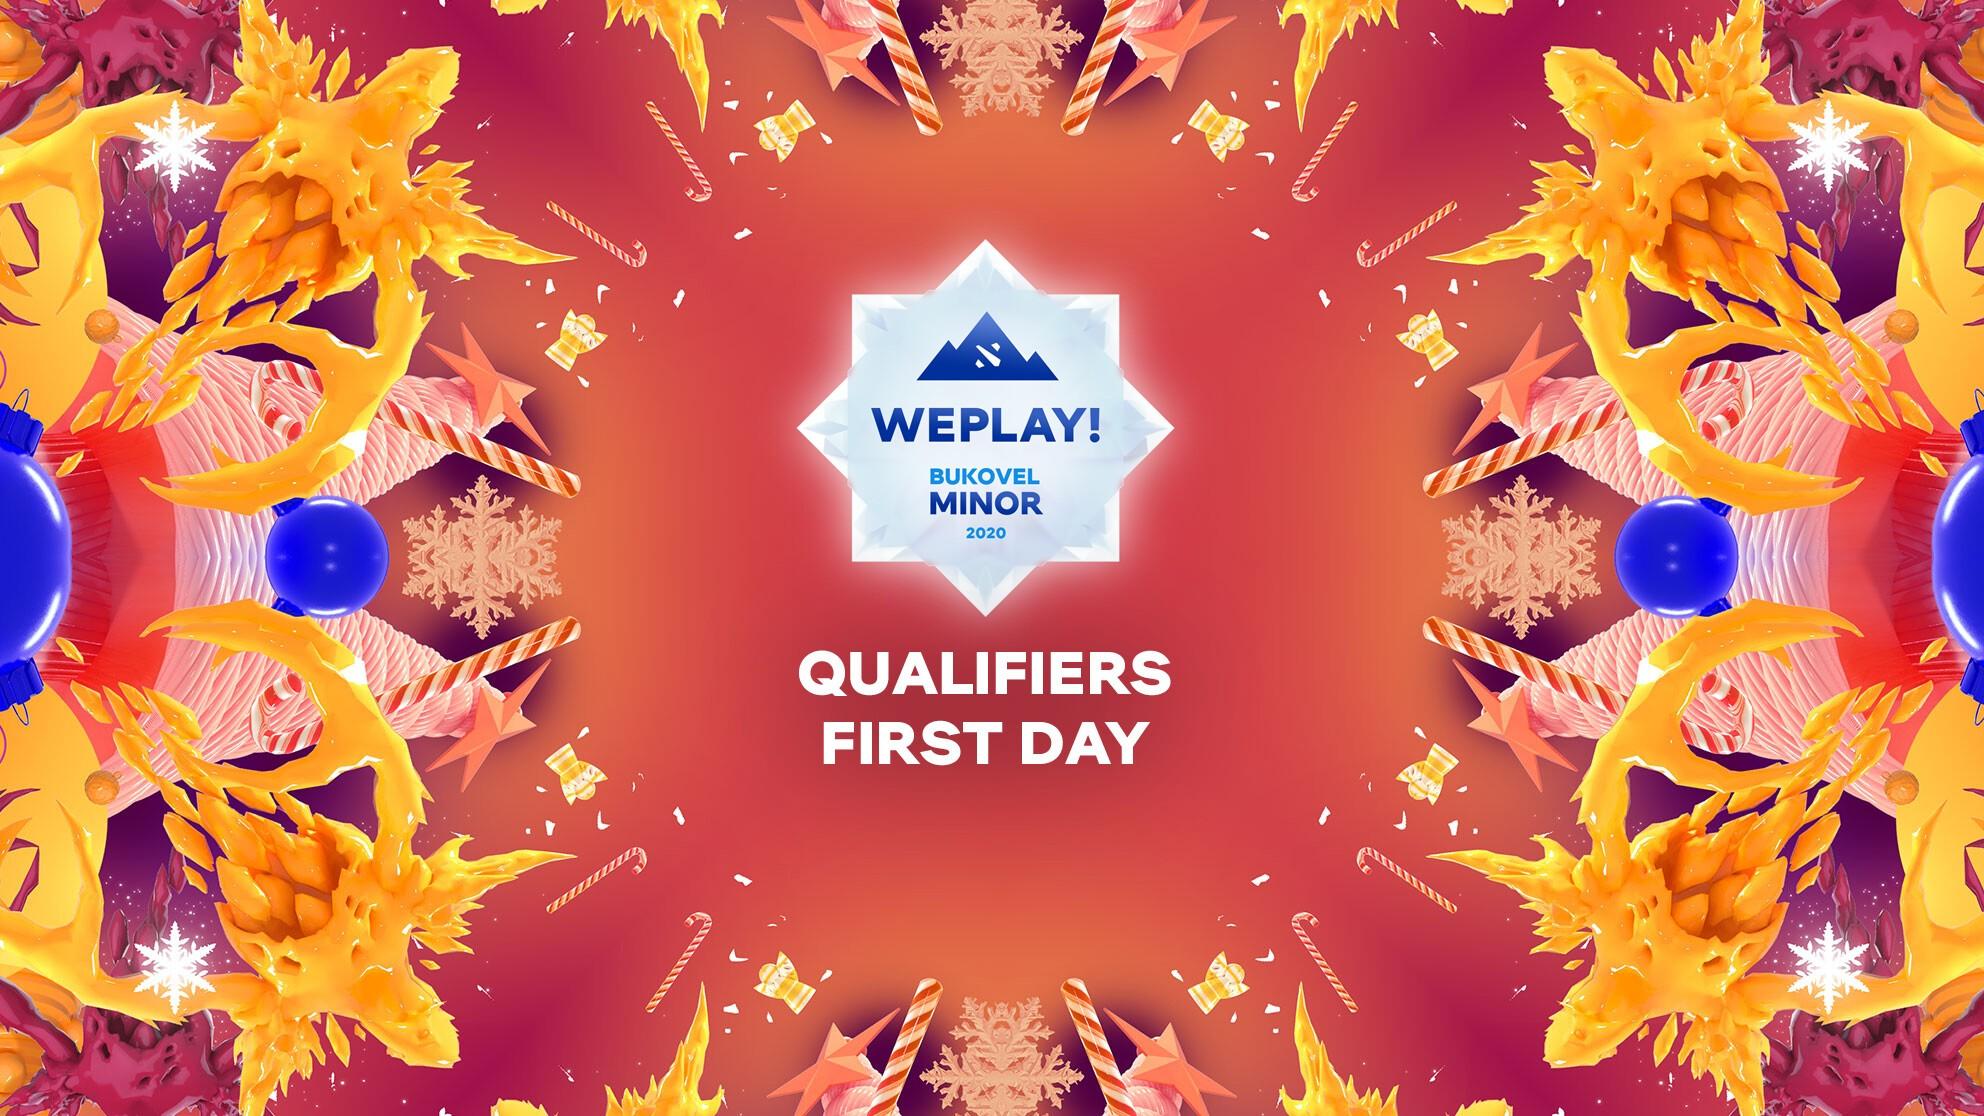 Live: WePlay! Bukovel Minor 2020 Qualifiers